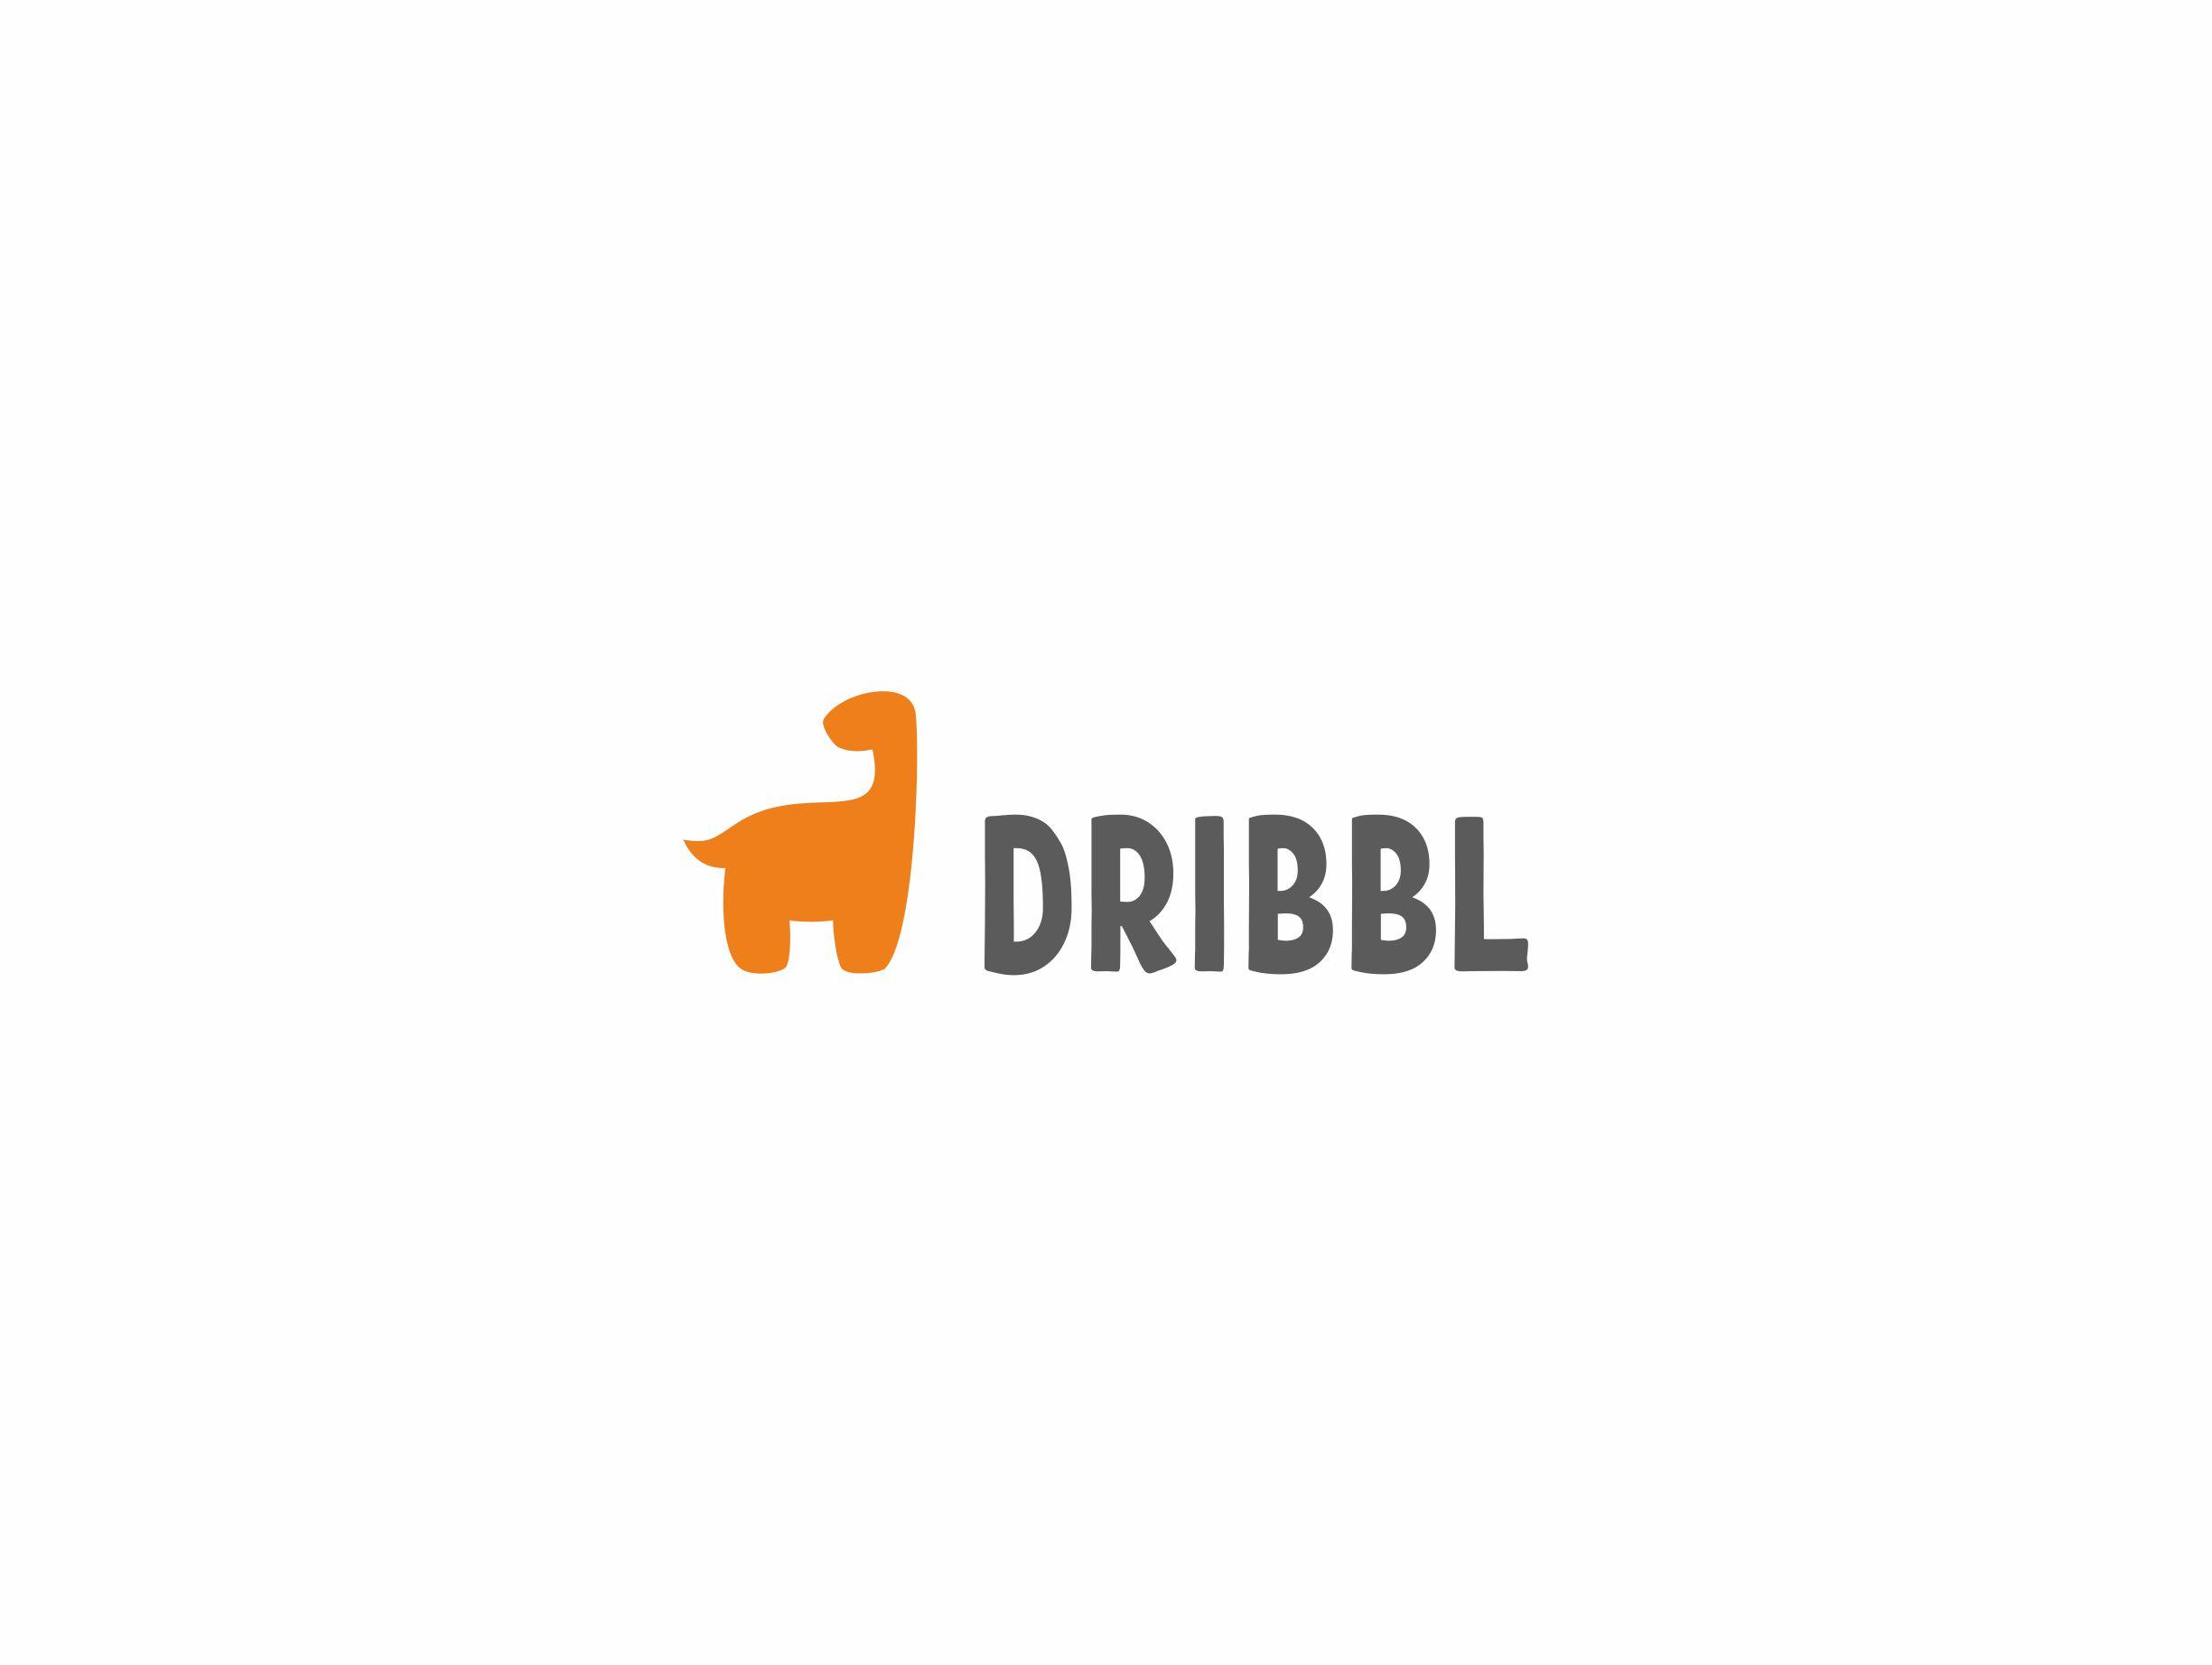 Разработка логотипа для сайта Dribbl.ru фото f_9265a9efb8014b3a.jpg